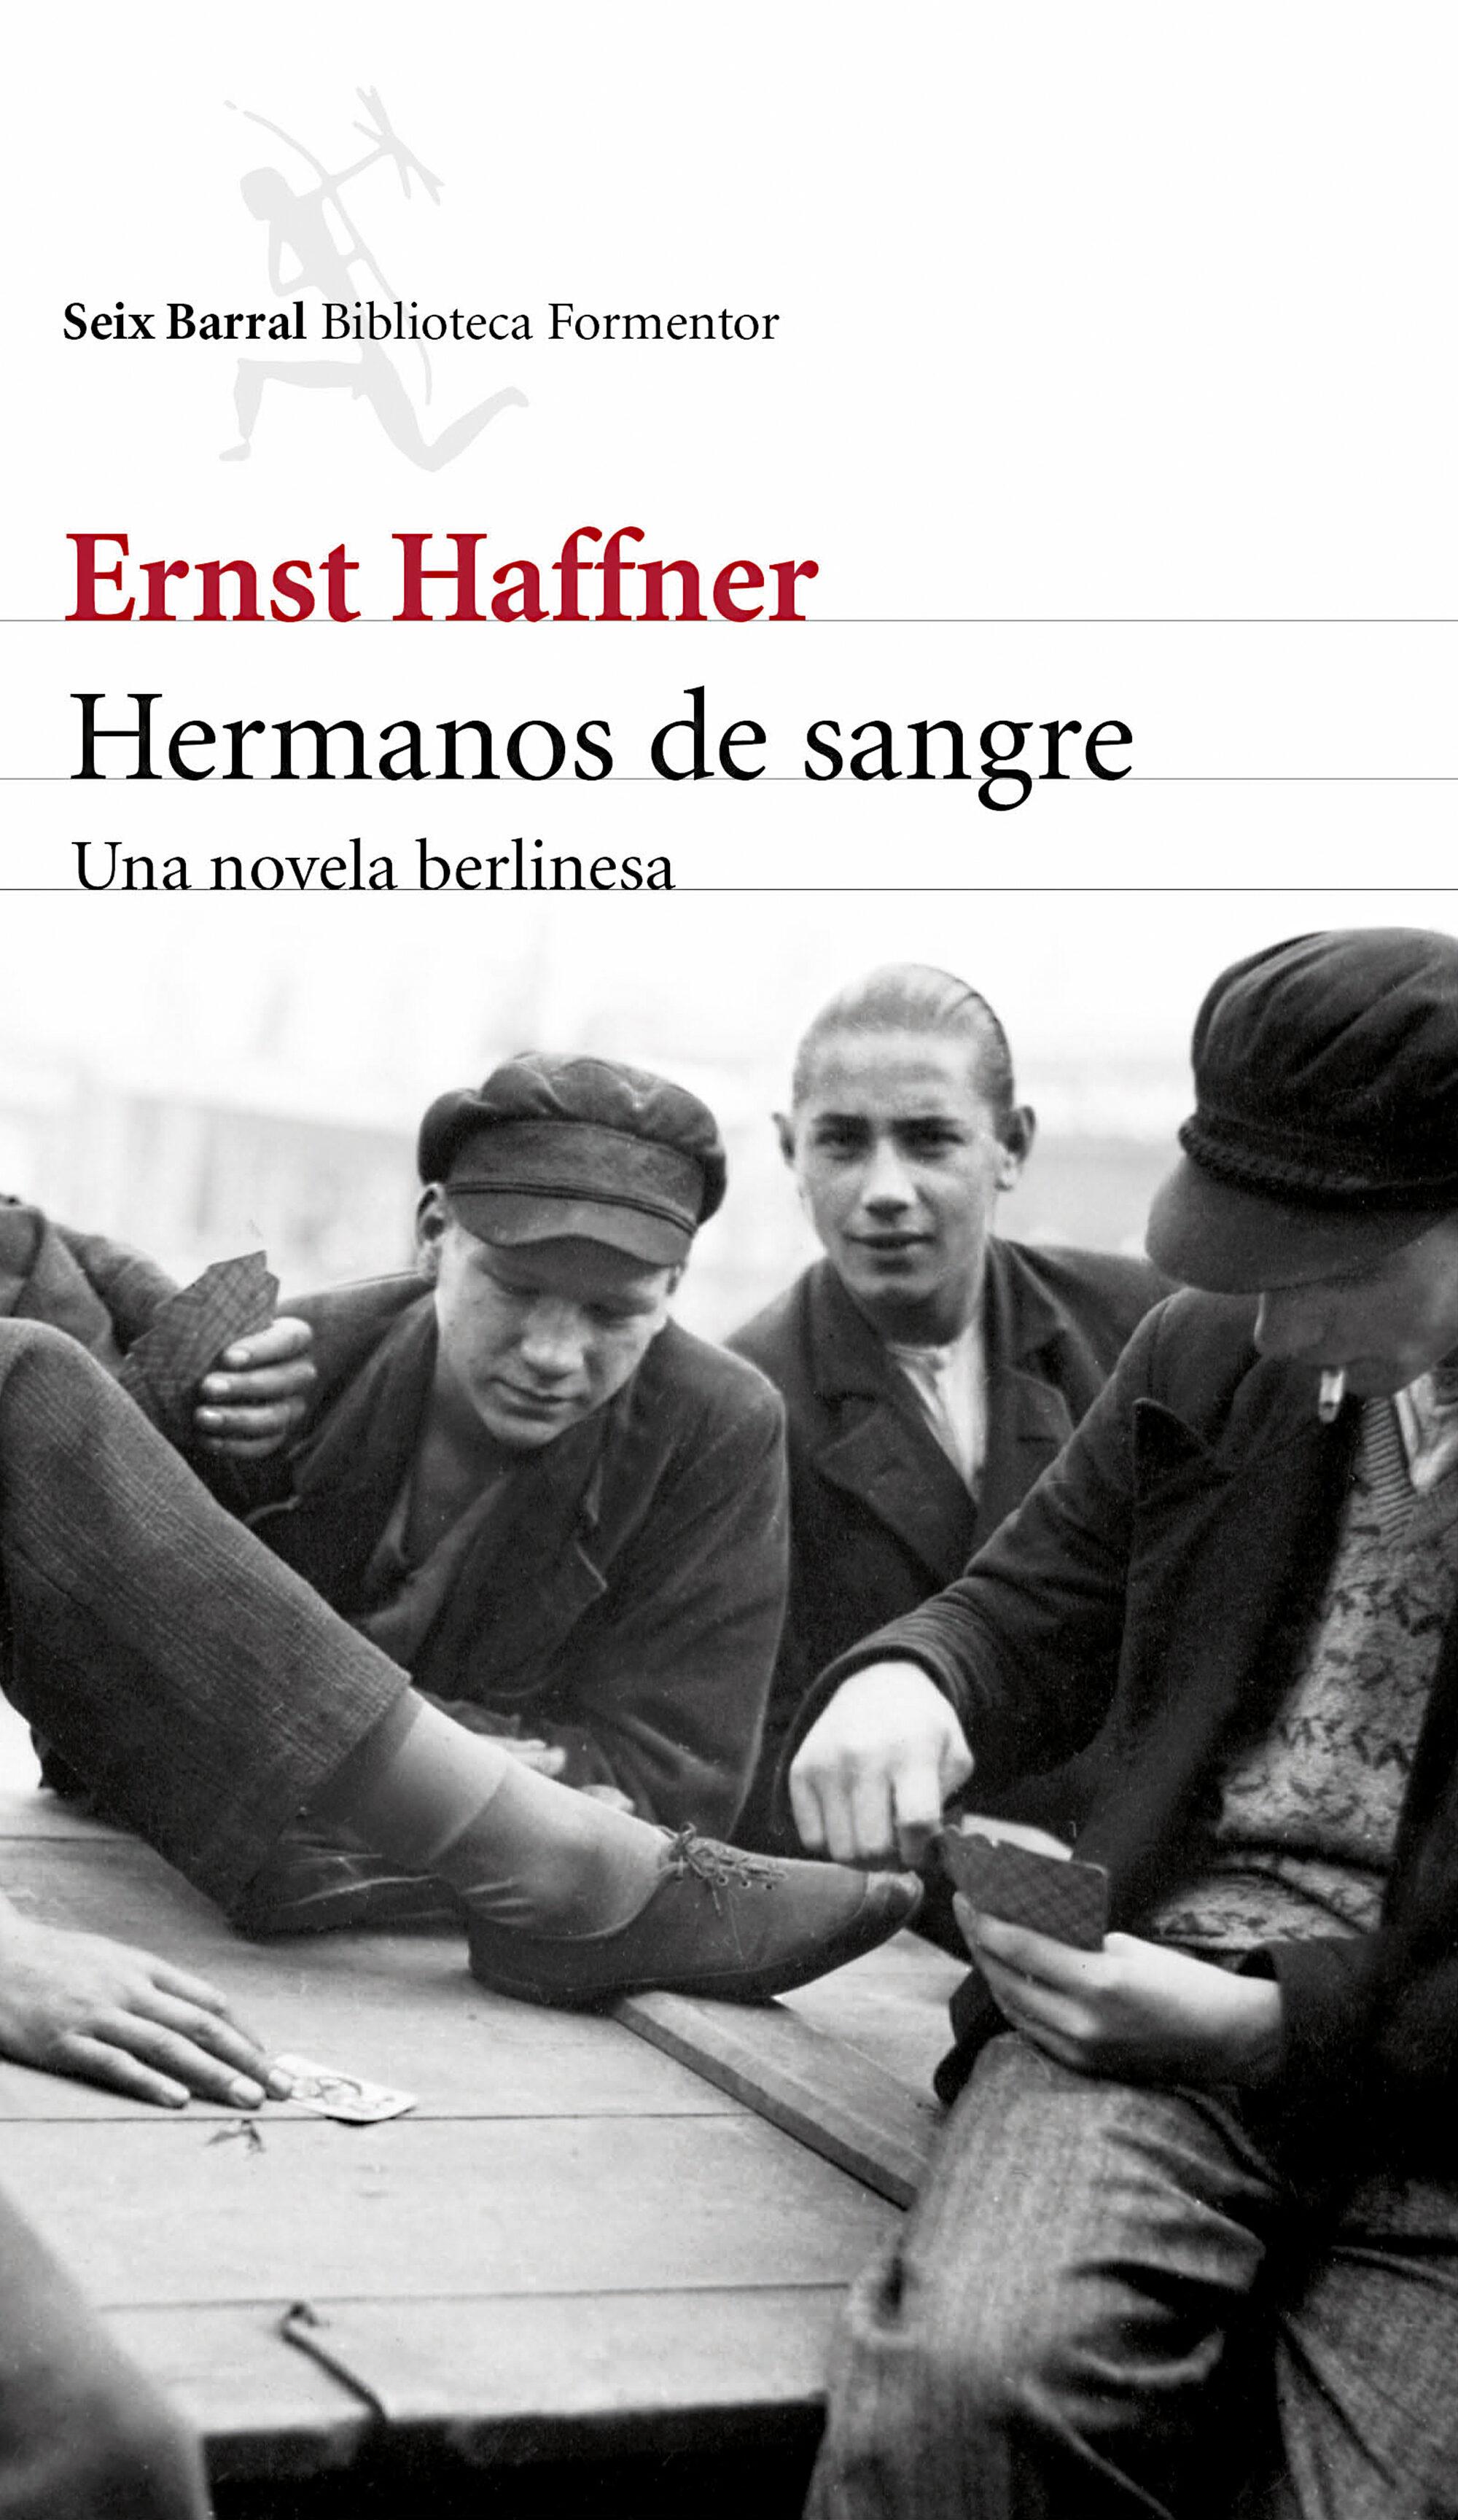 hermanos de sangre-ernst haffner-9788432224508